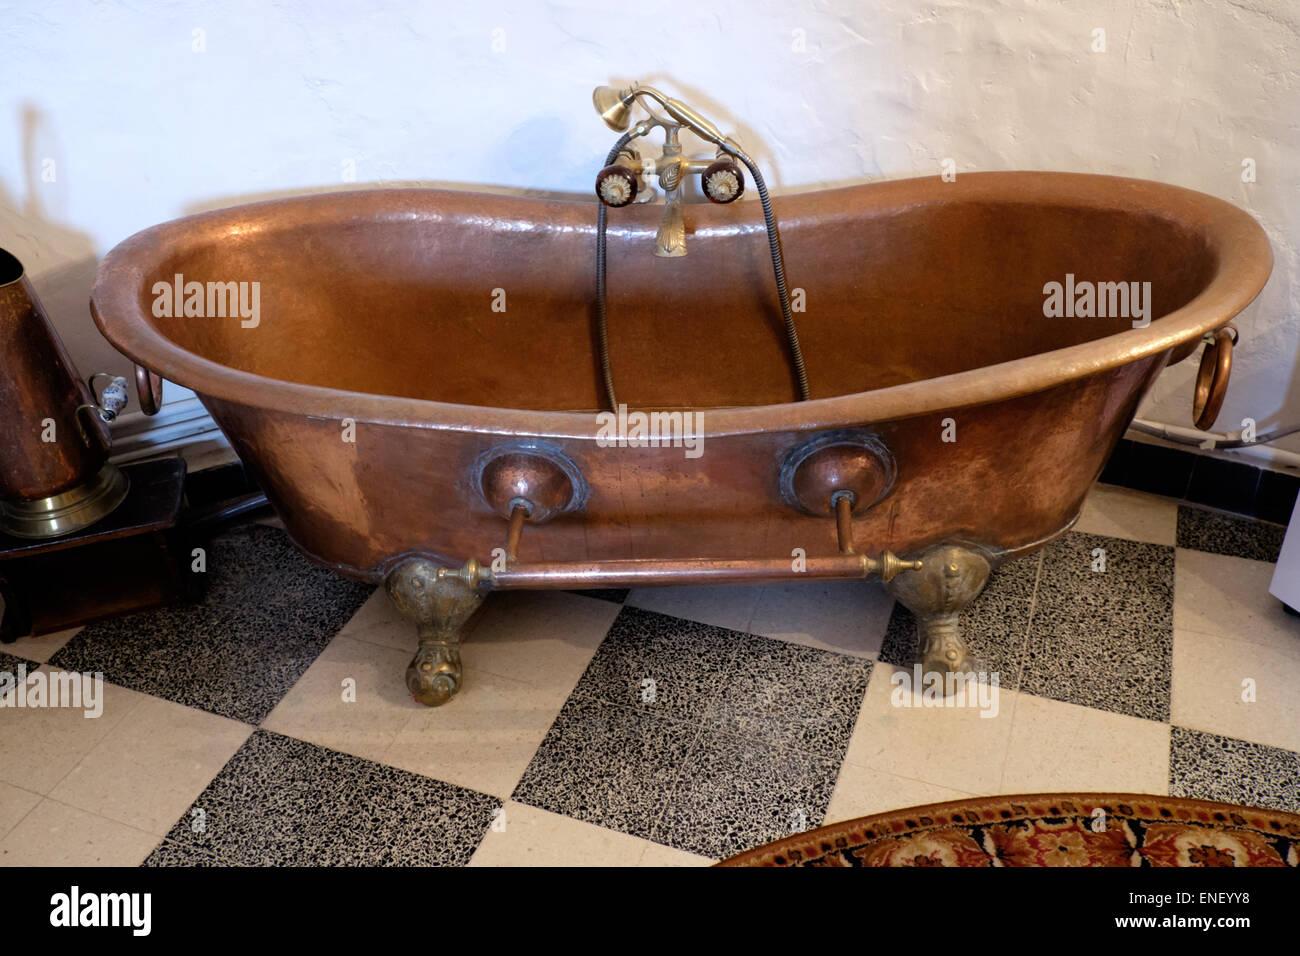 Vasca Da Bagno In Francese : Il rame vasca da bagno in antico francese chateau appartamento foto